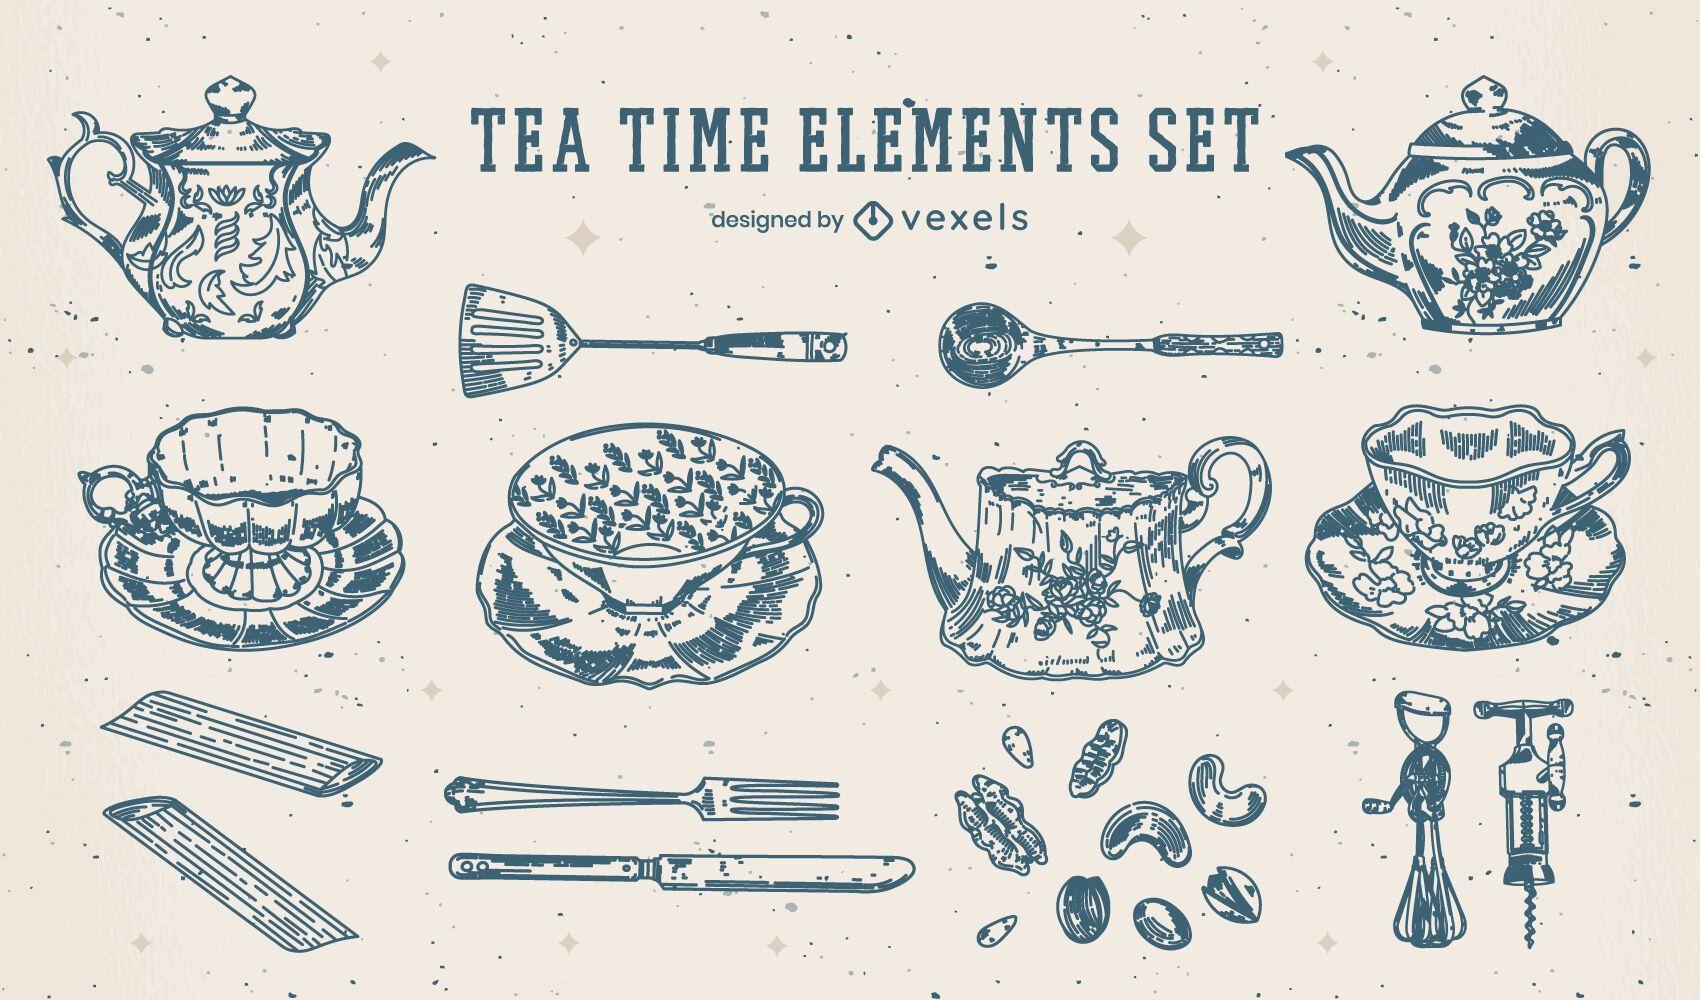 Conjunto de elementos vintage da hora do chá